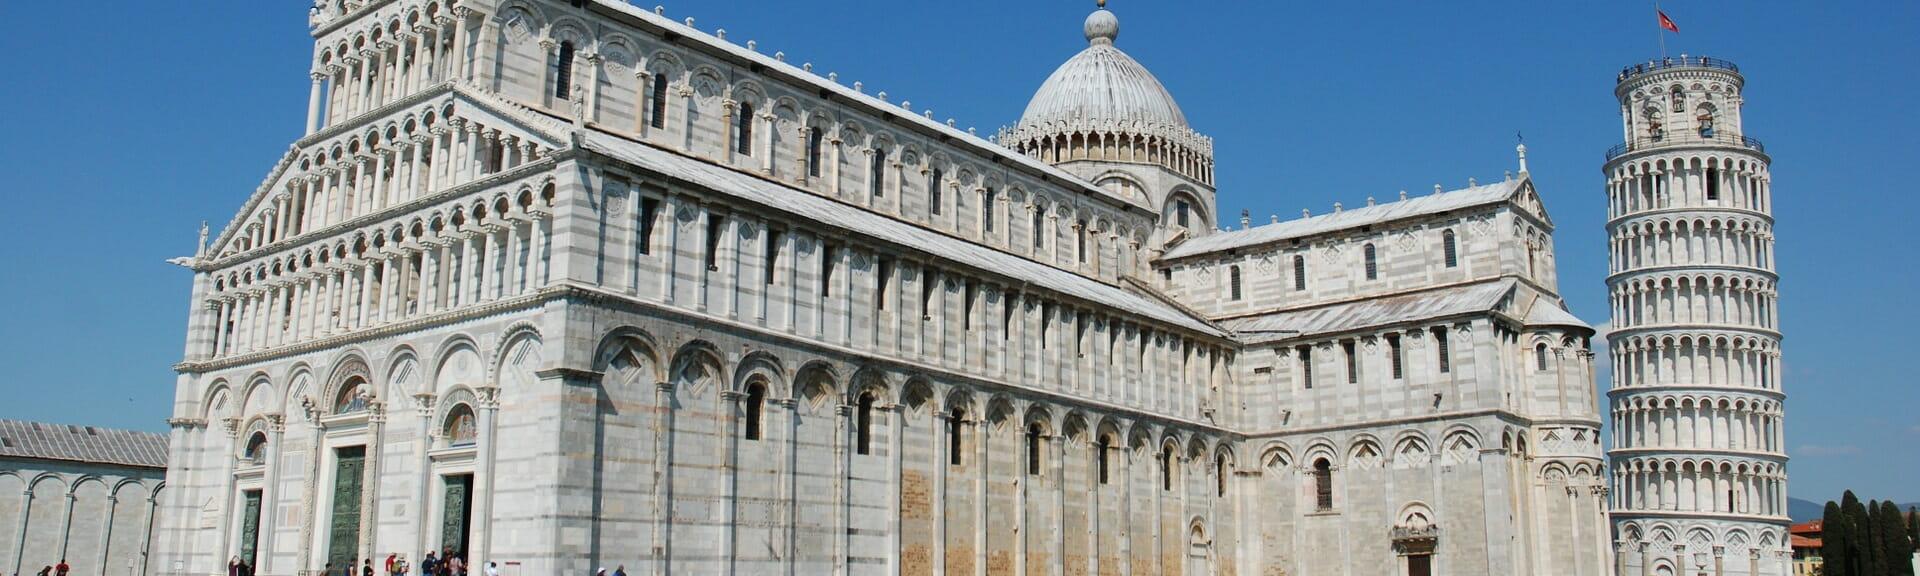 Klassenfahrt Pisa der schiefe Turm